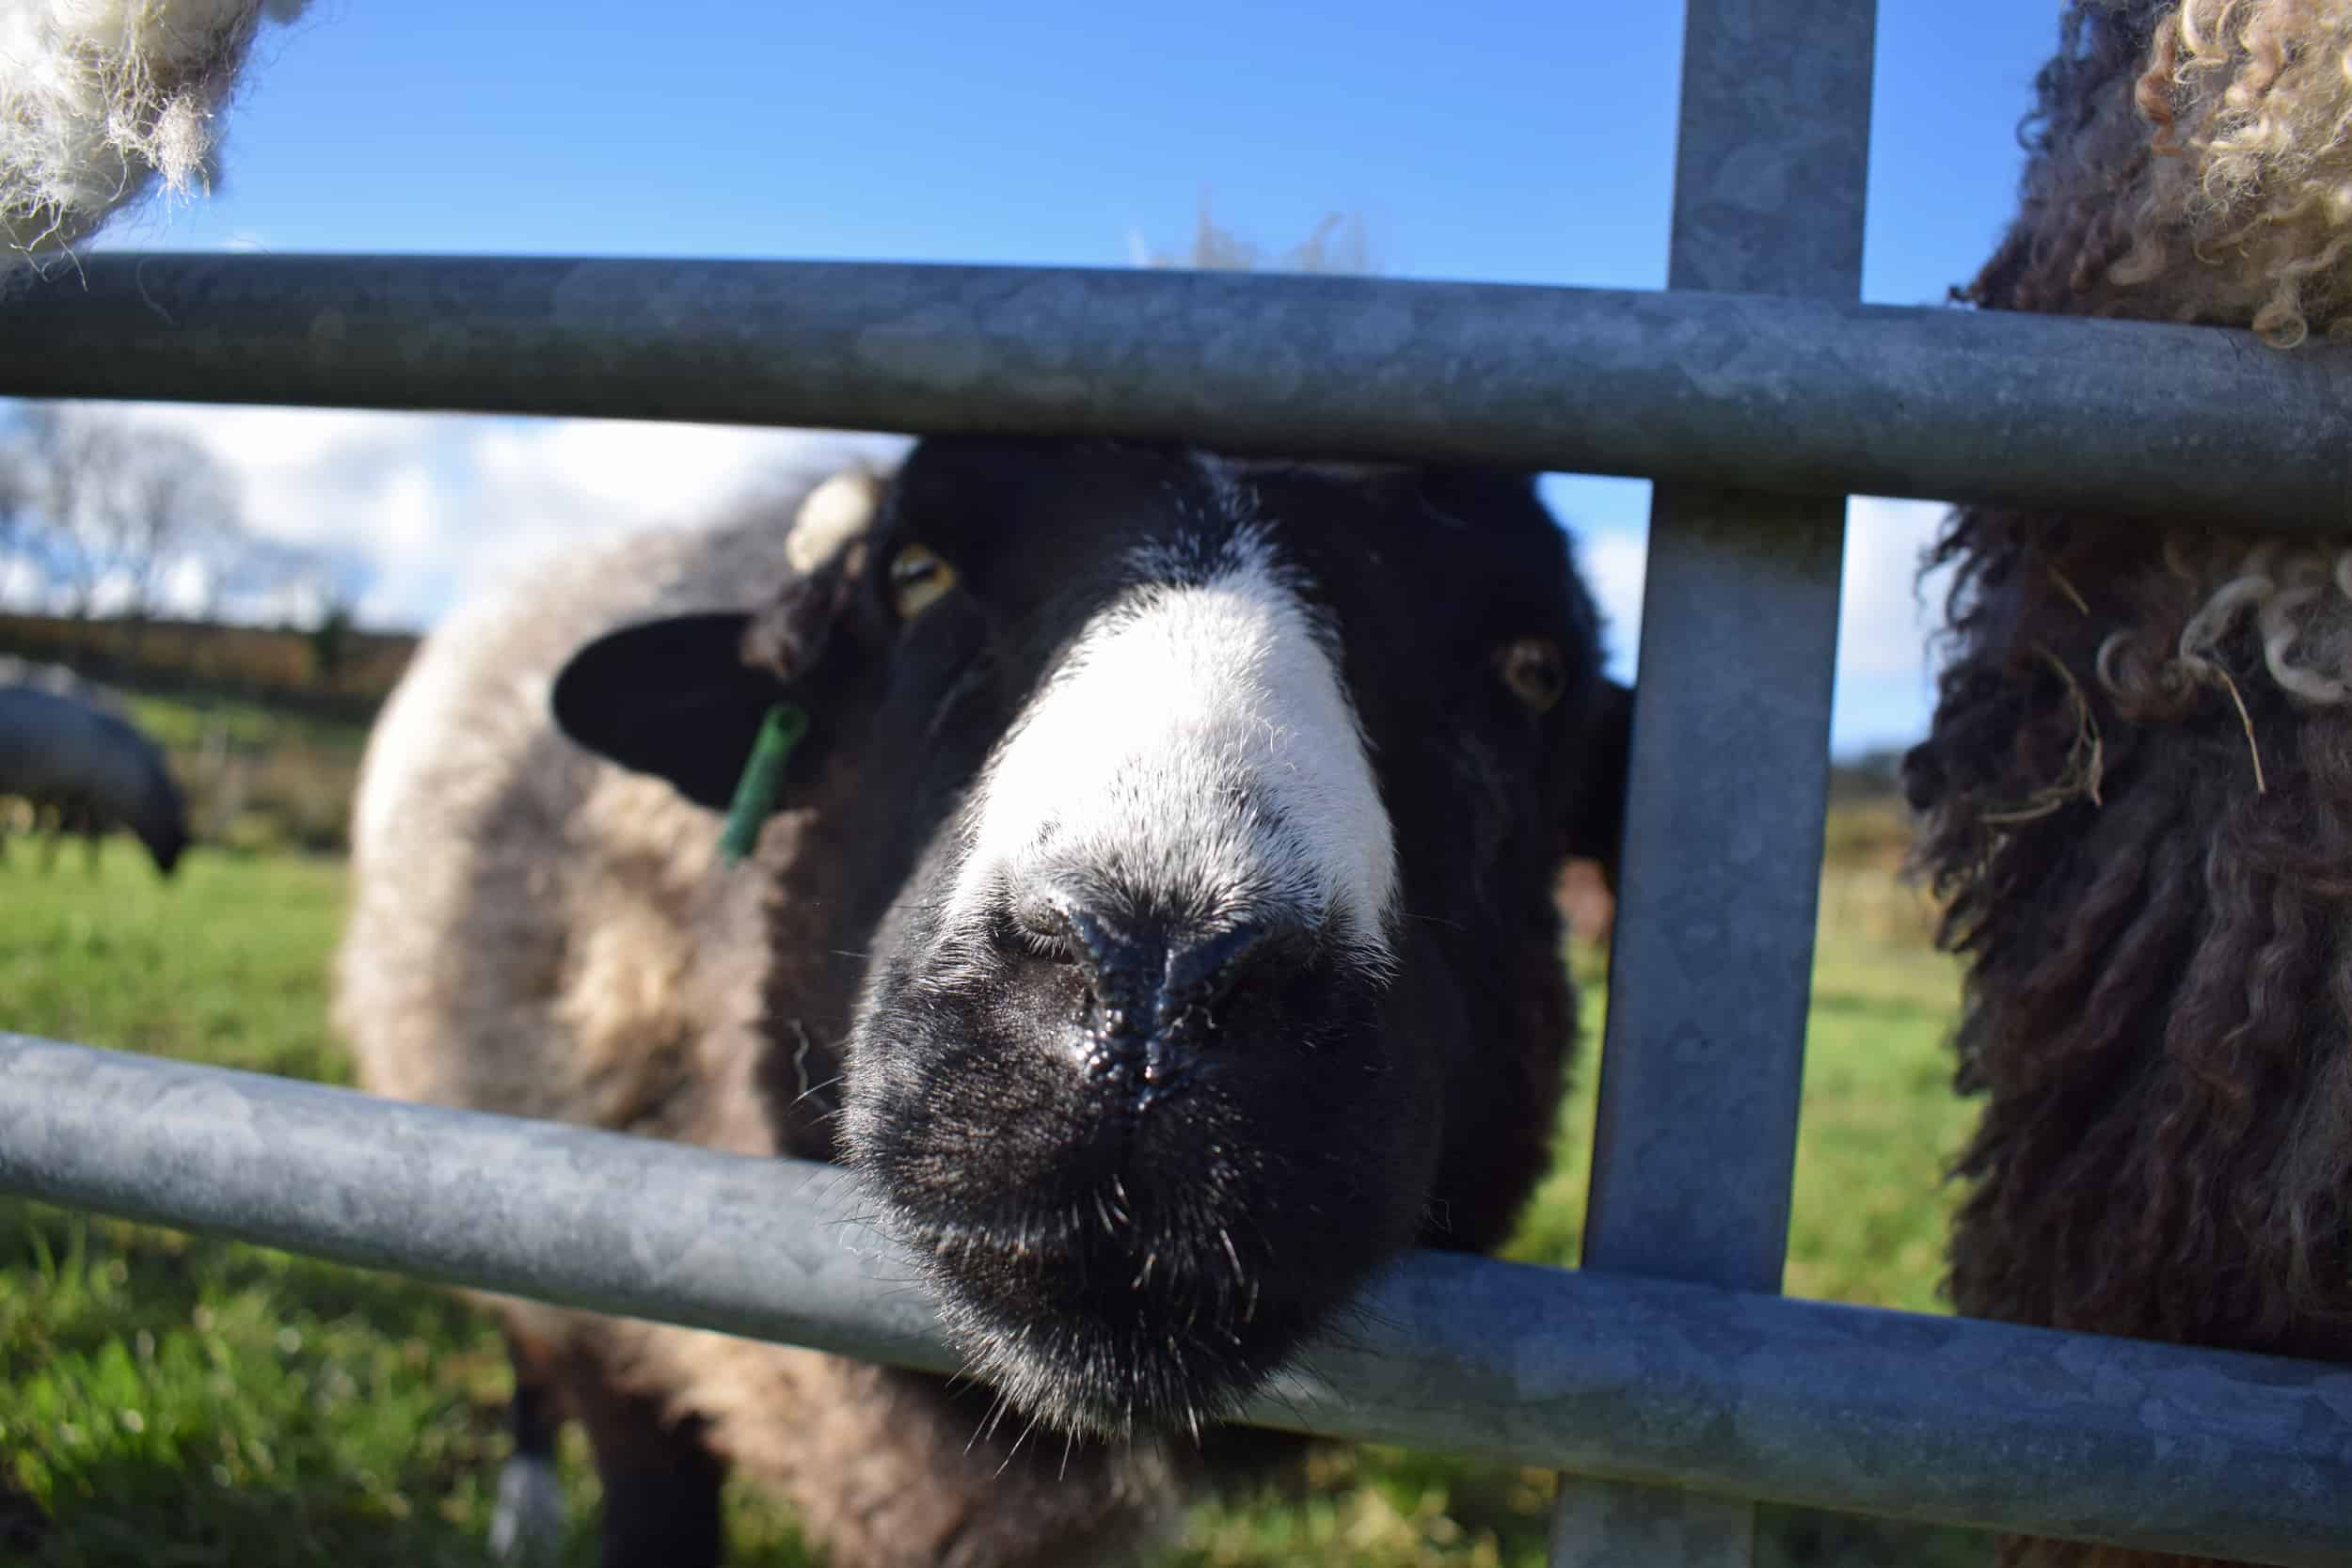 Holly feed me pet lamb sheep jacob cross shetland spotted black grey white wales gwynedd british wool gifts homeware